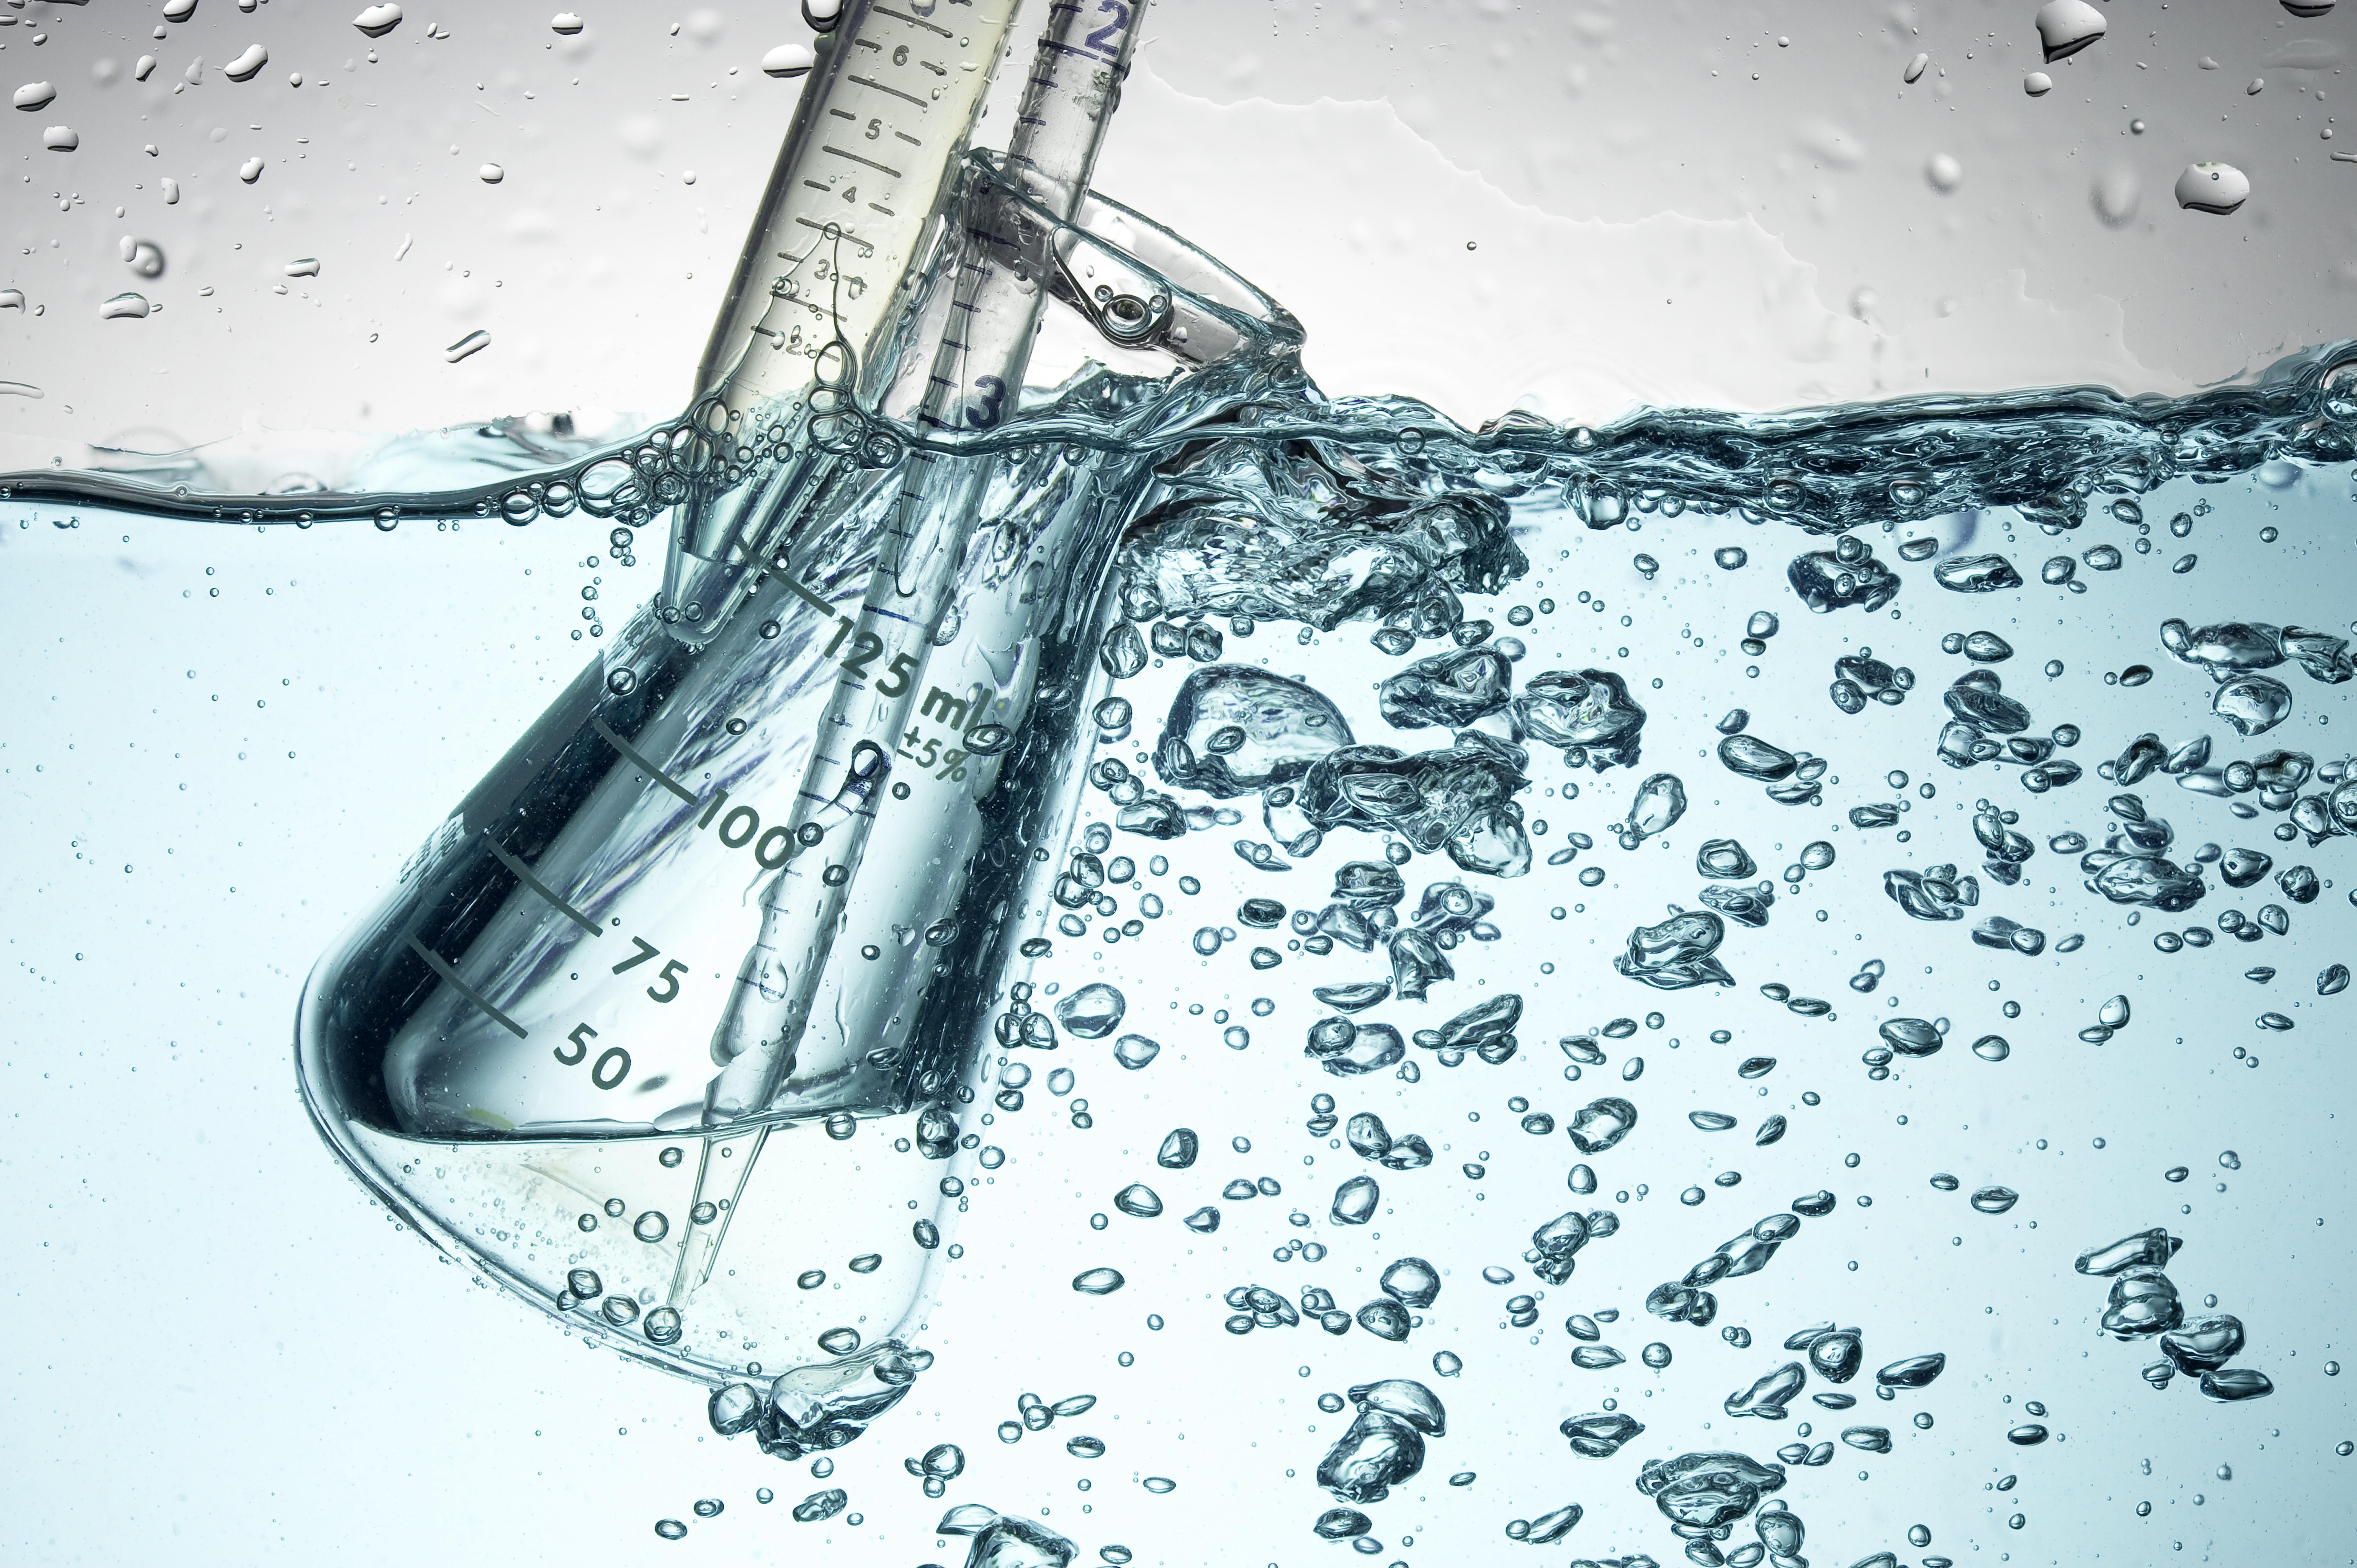 Жесткая вода картинки